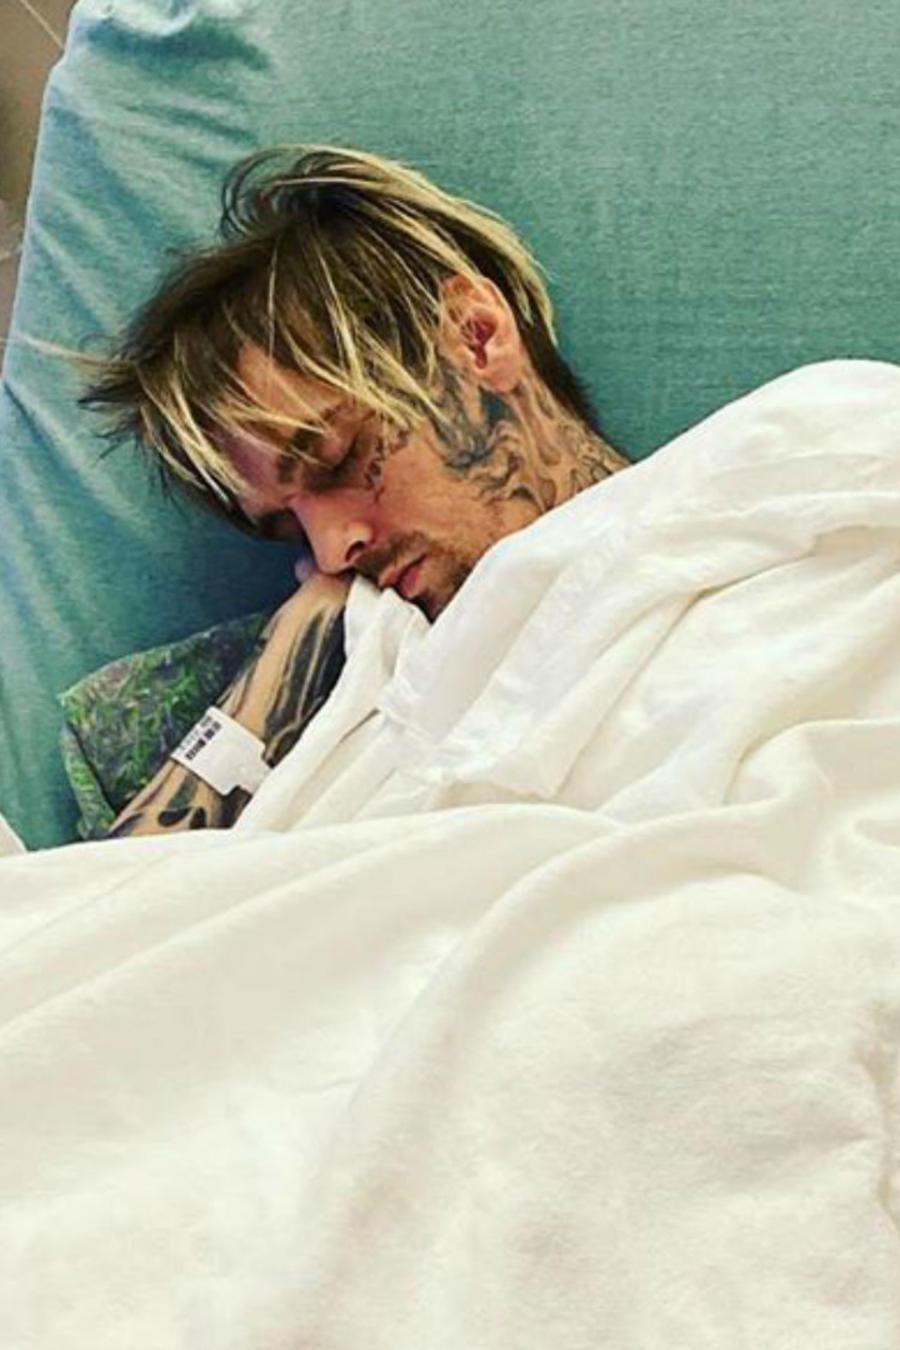 Aaron Carter en el hospital